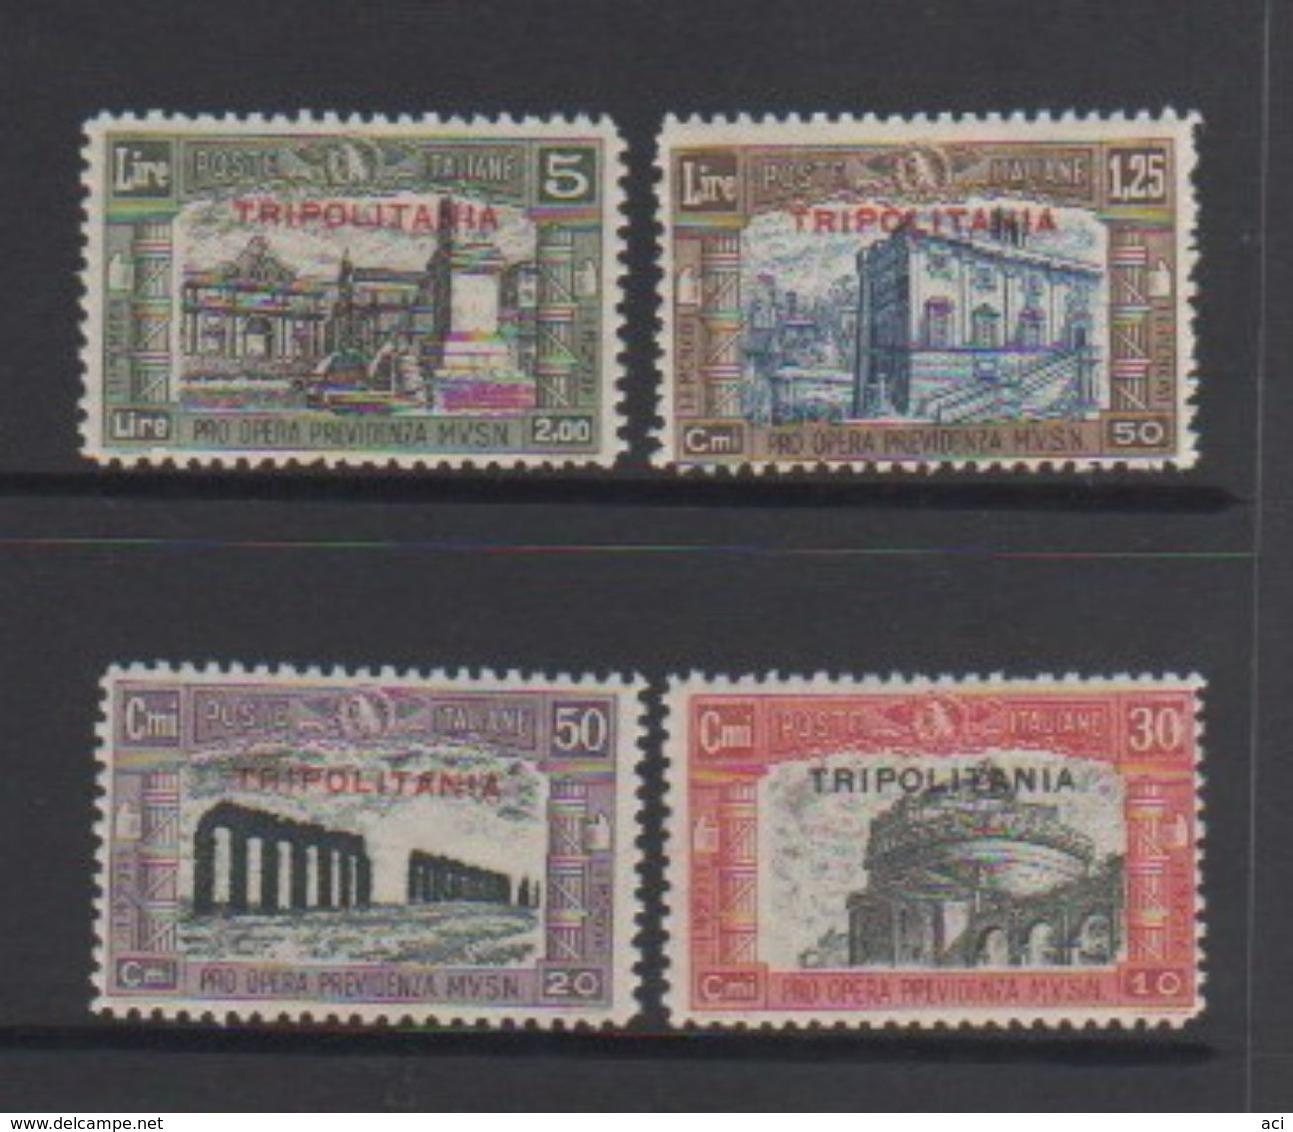 Italy-Colonies And Territories-Tripolitania S 50-53 1929 Militia II Set MNH - Tripolitania